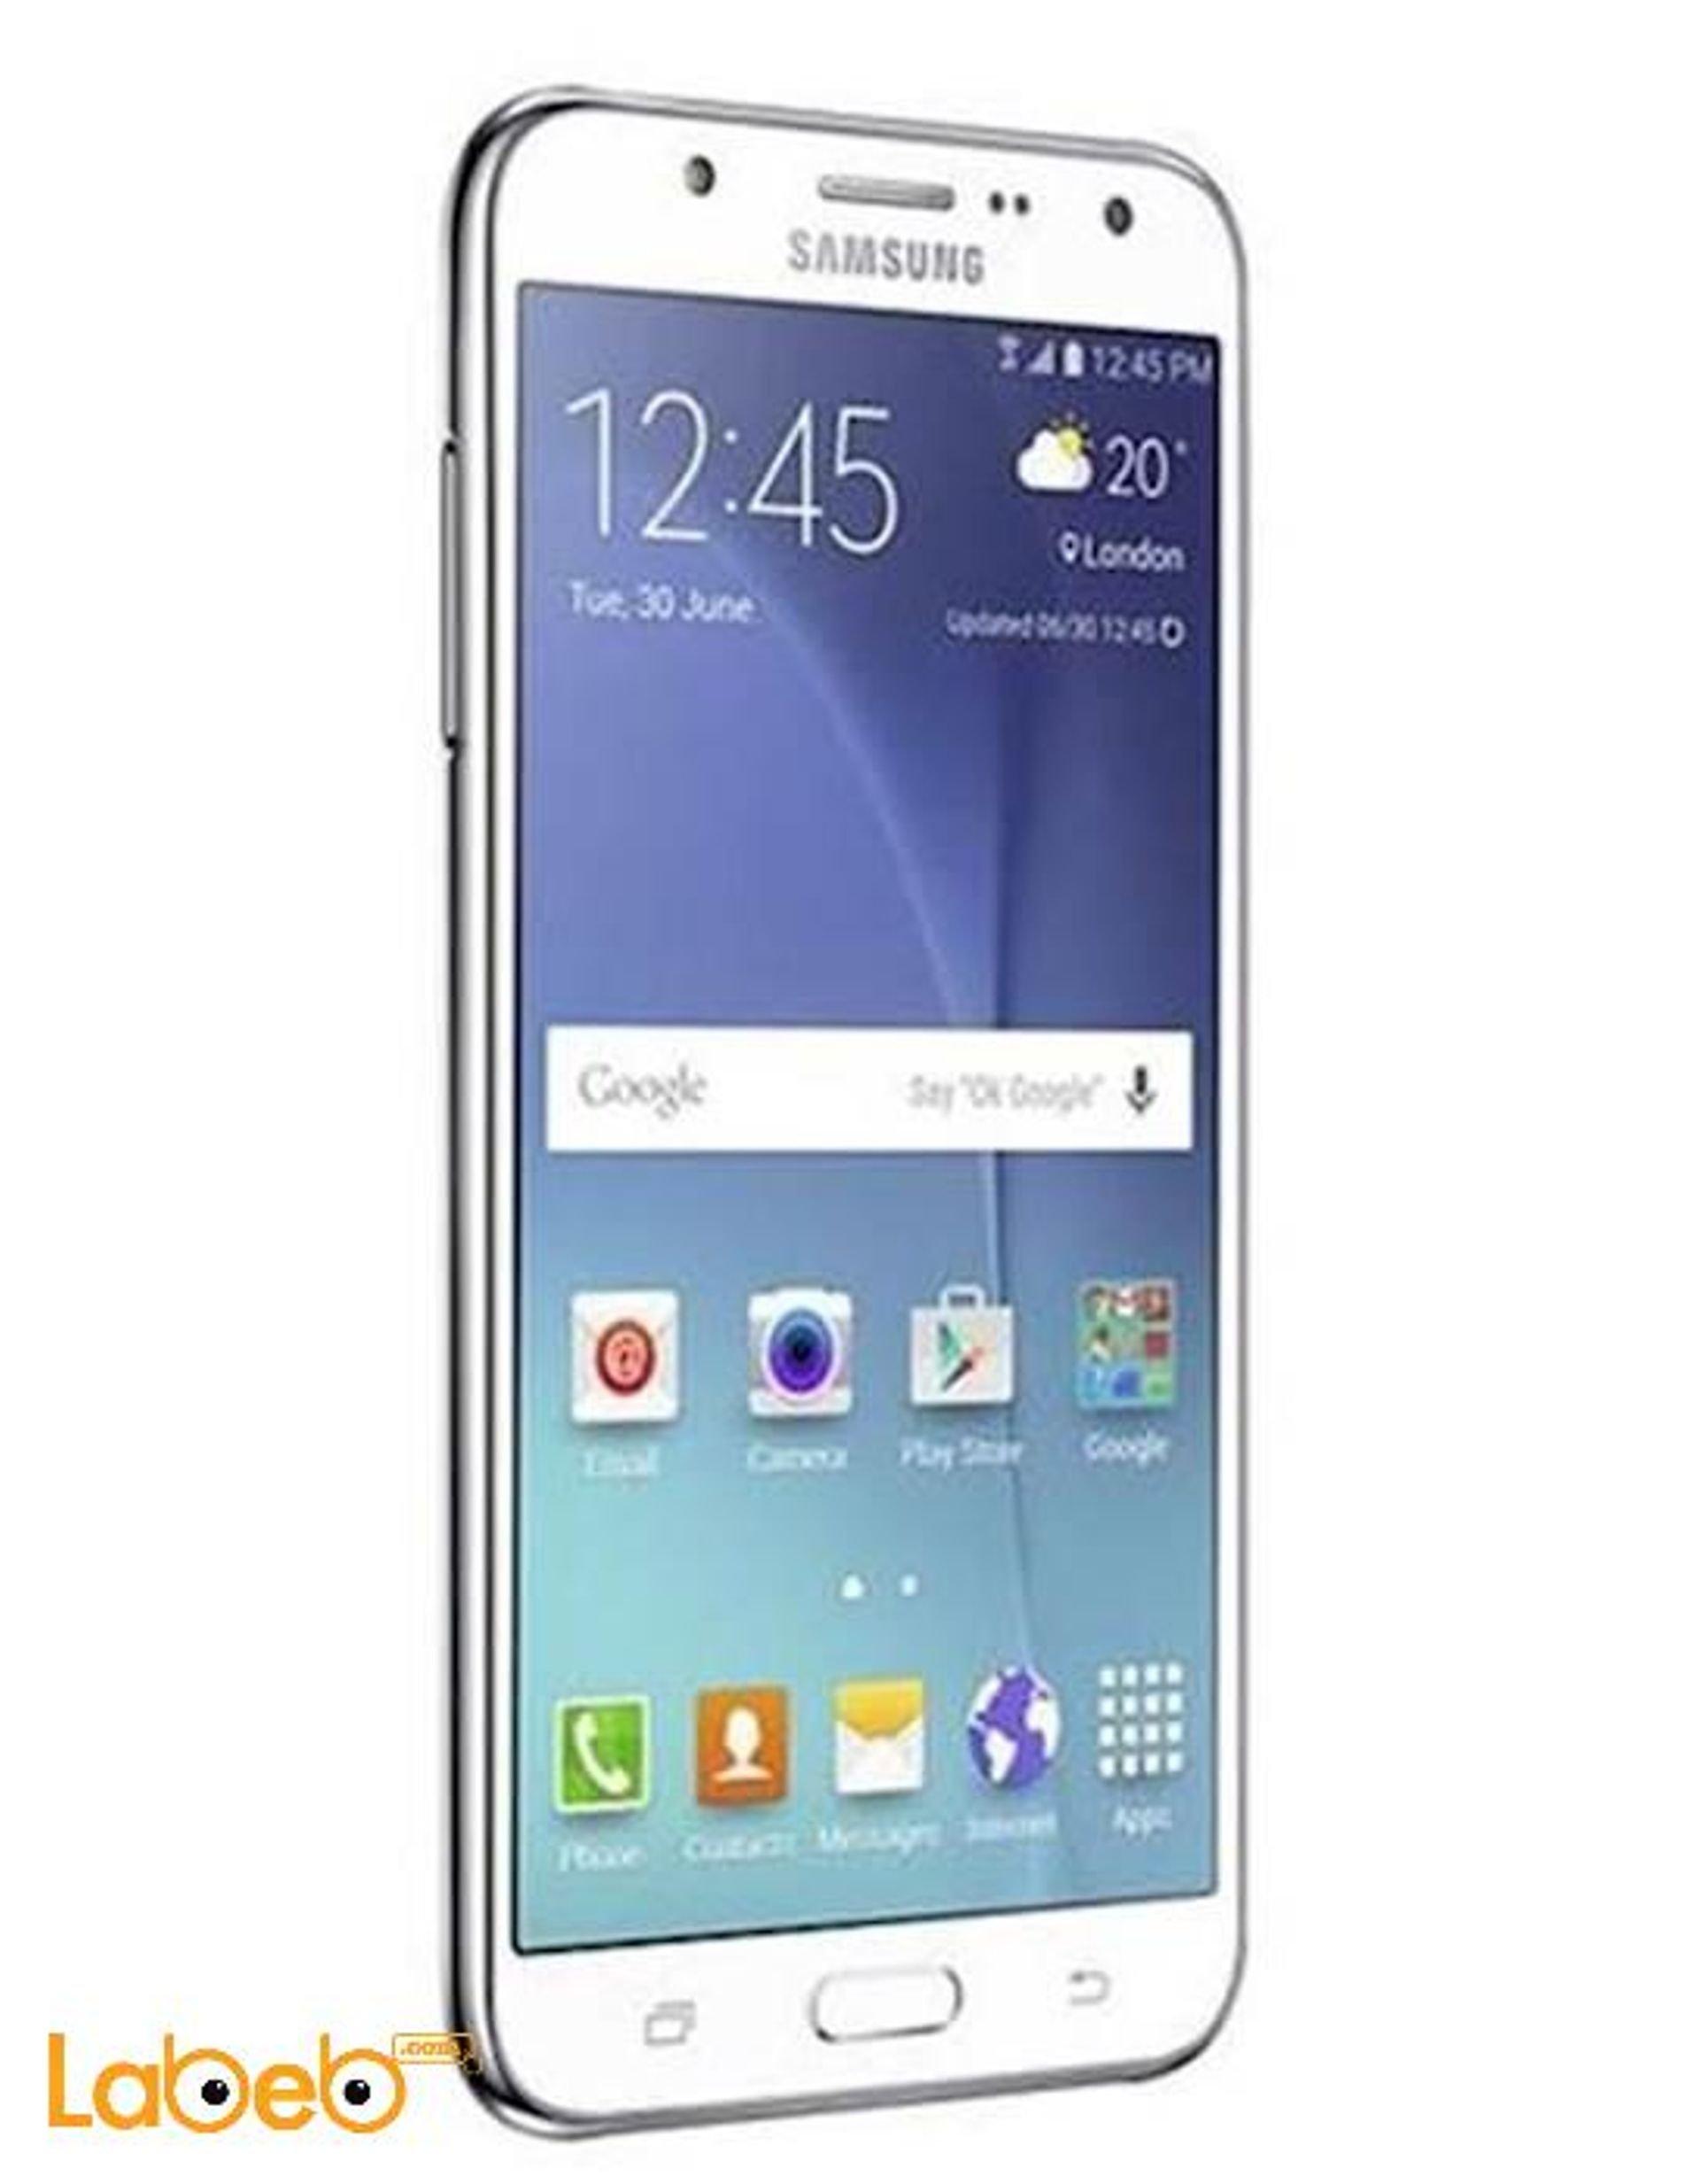 7a8181bcf76ab موبايل سامسونج جلاكسي J7، أبيض، ذاكرة 16GB، يدعم 3G